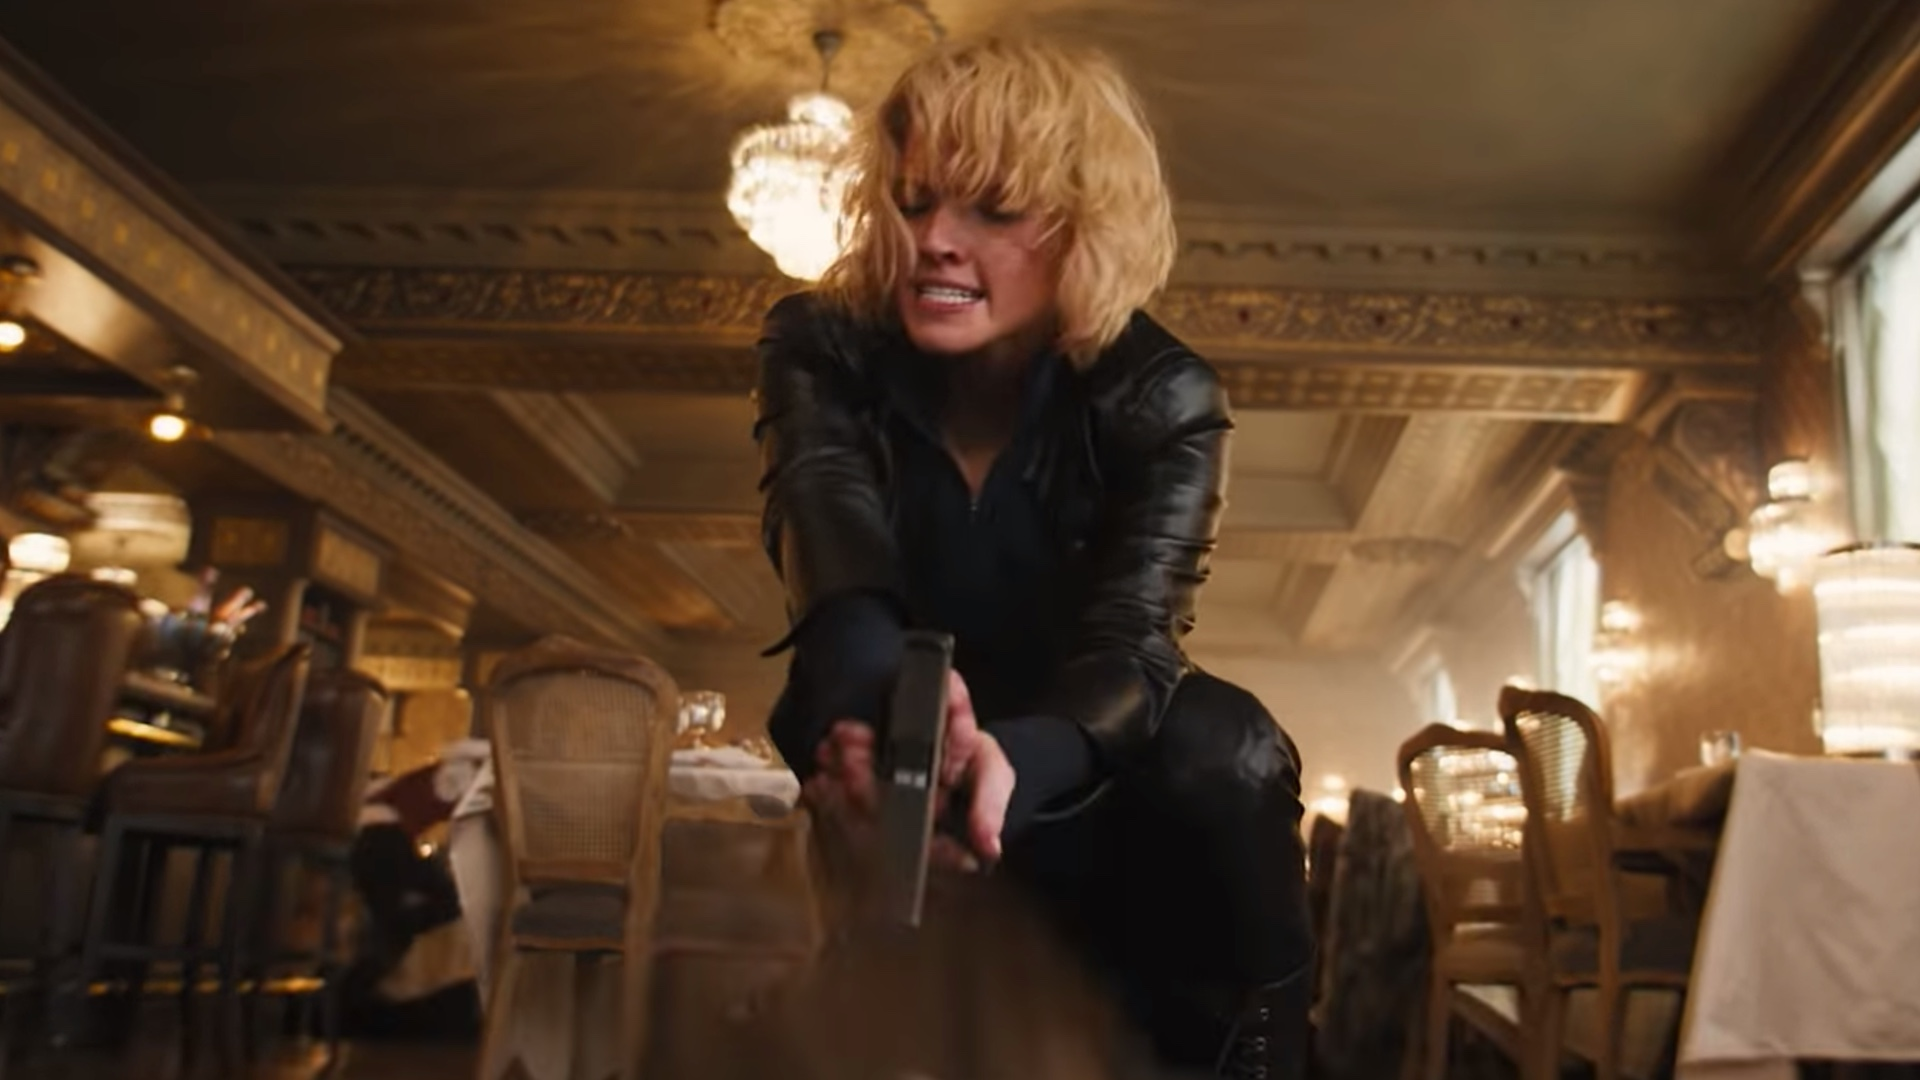 kick-ass-trailer-for-director-luc-bessons-latest-action-thriller-anna-social.jpg